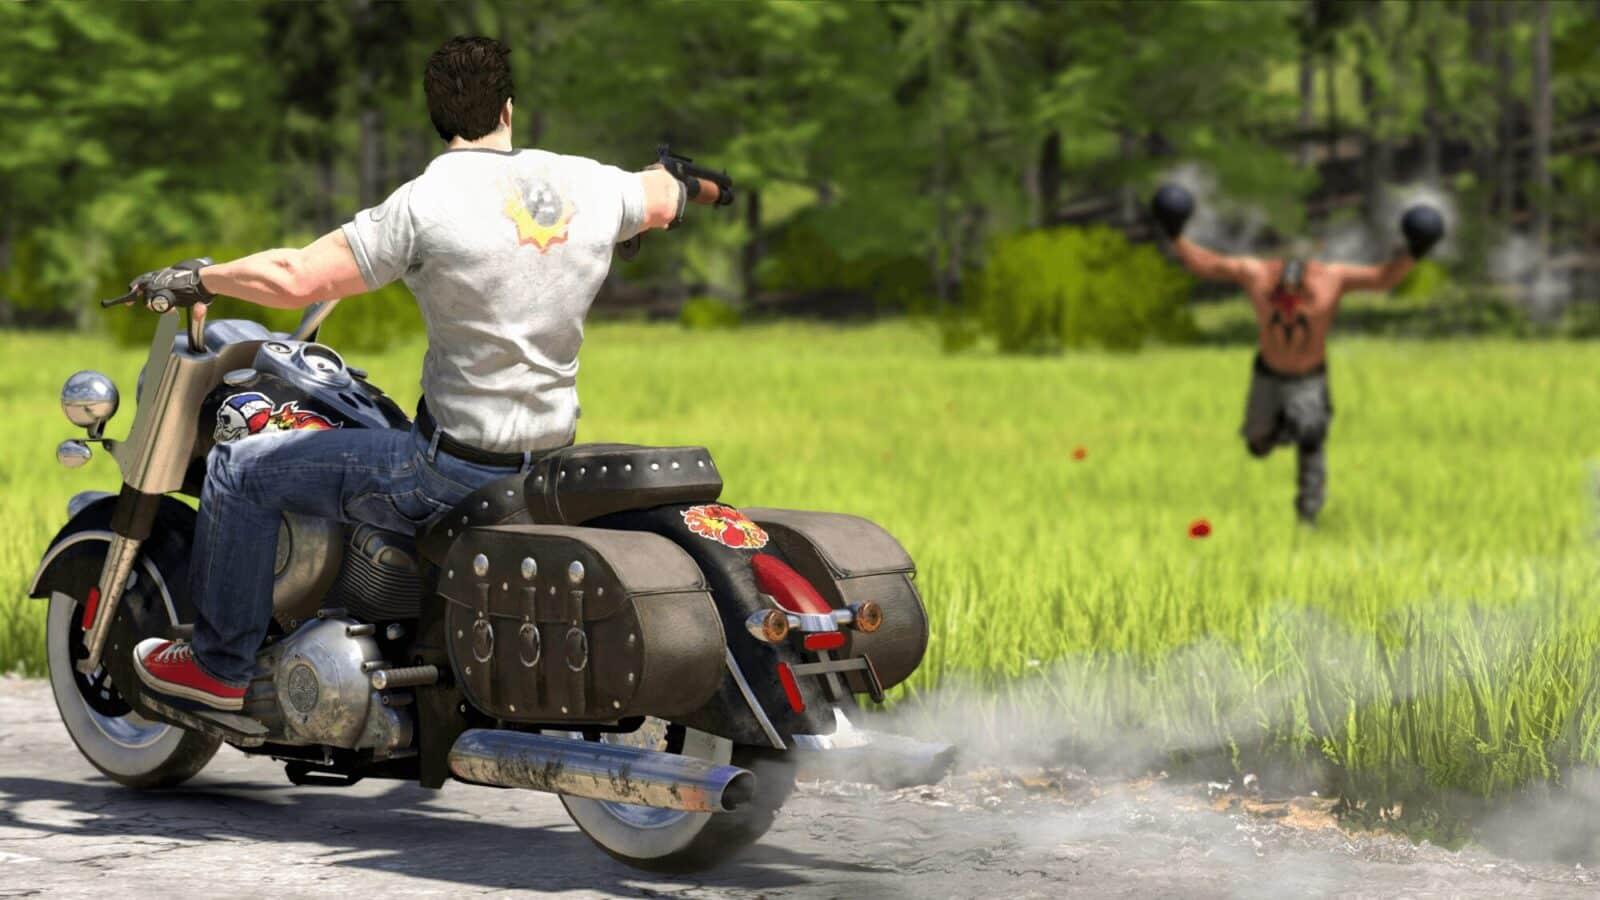 Serious Sam 4 - Motorcycle Shot